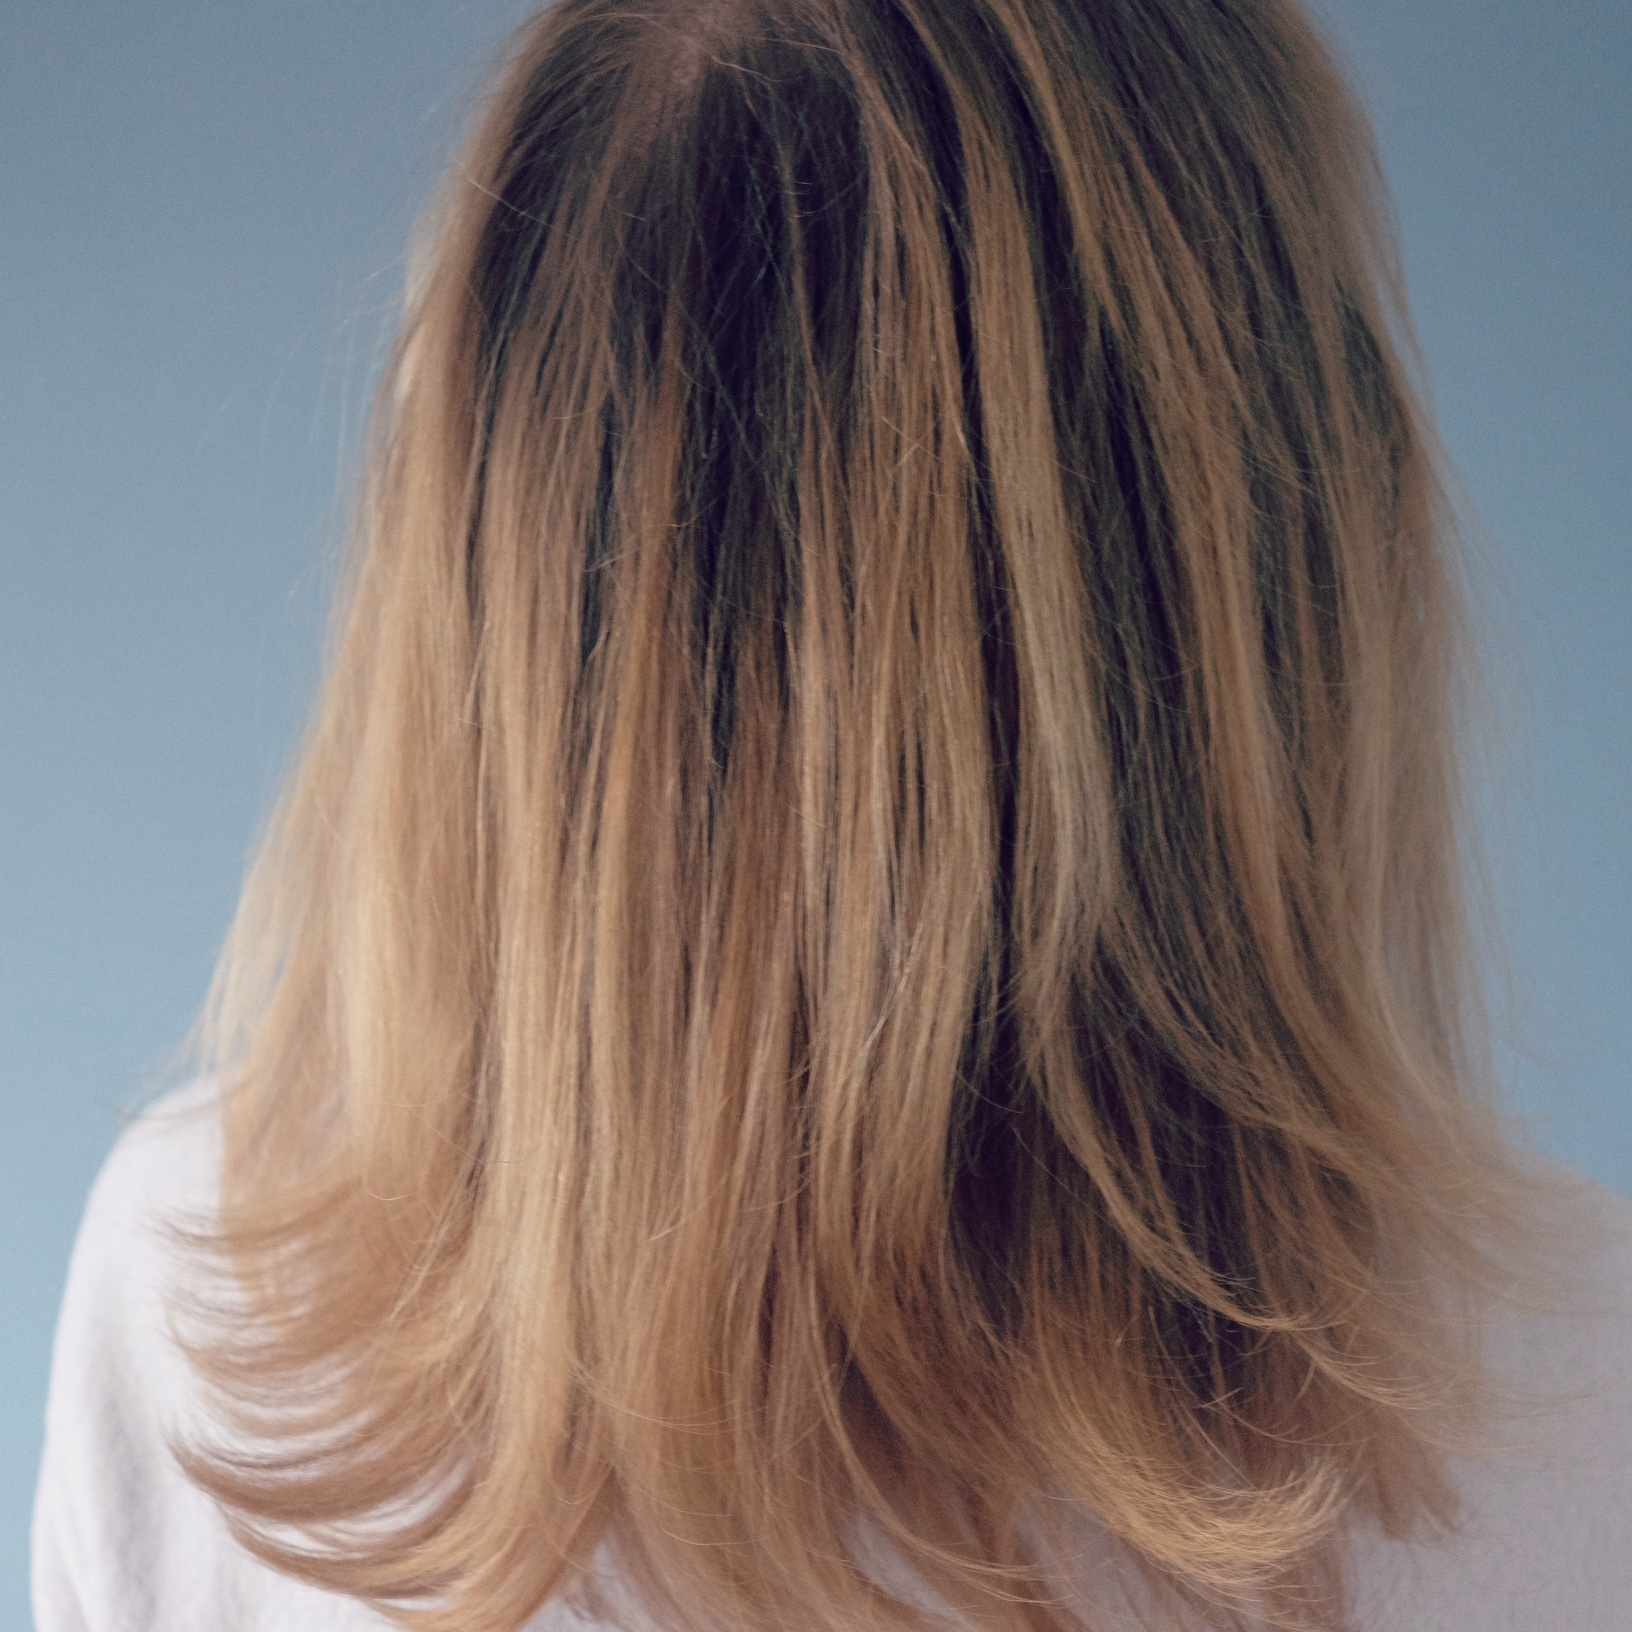 žitná mouka na vlasy